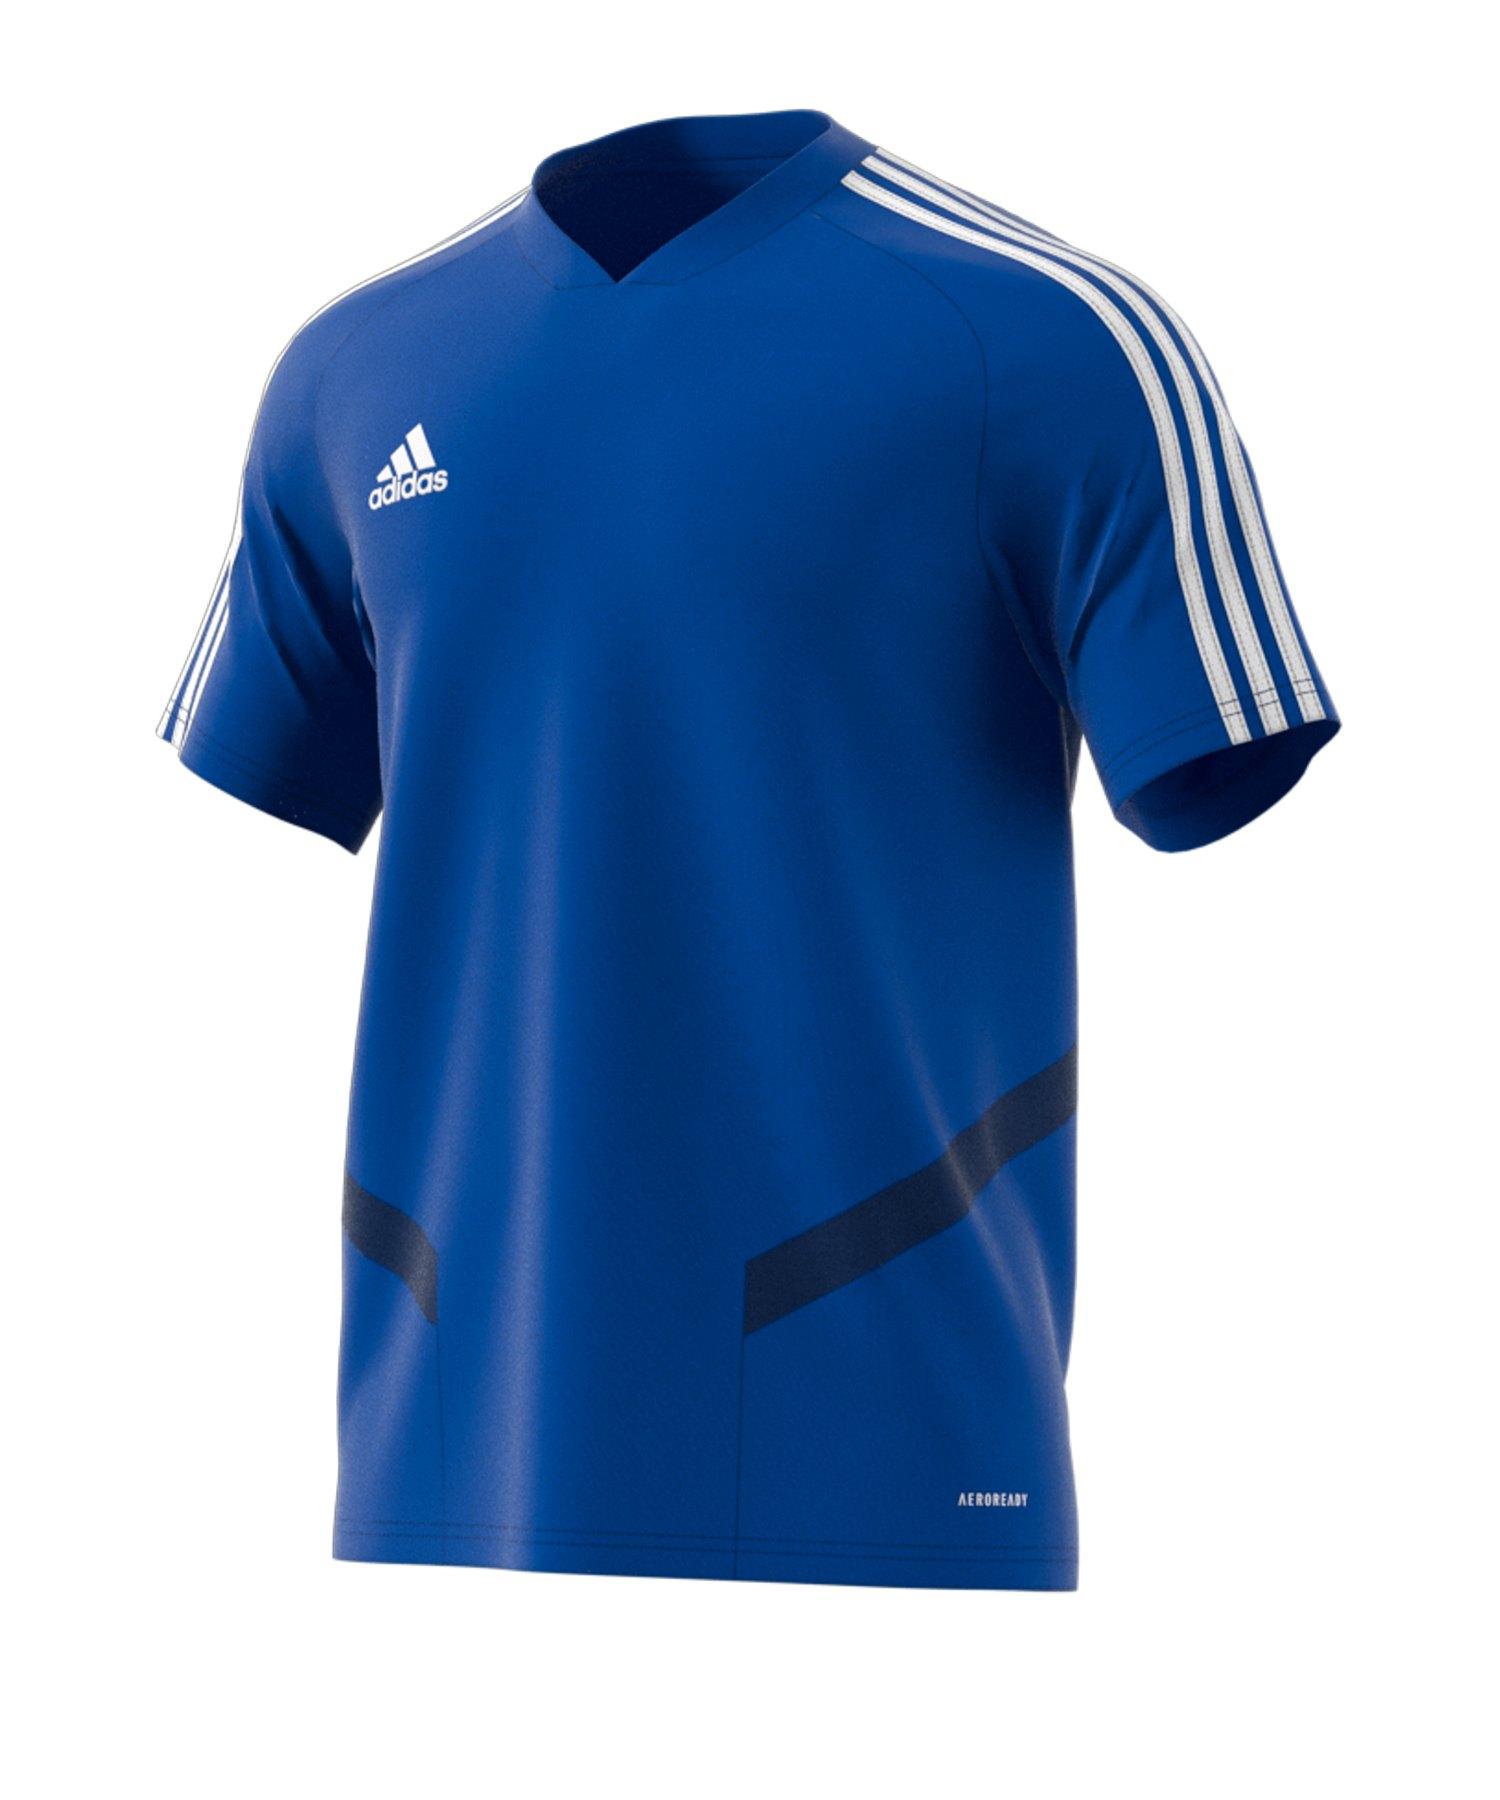 adidas Tiro 19 Trainingsshirt Blau Weiss - blau